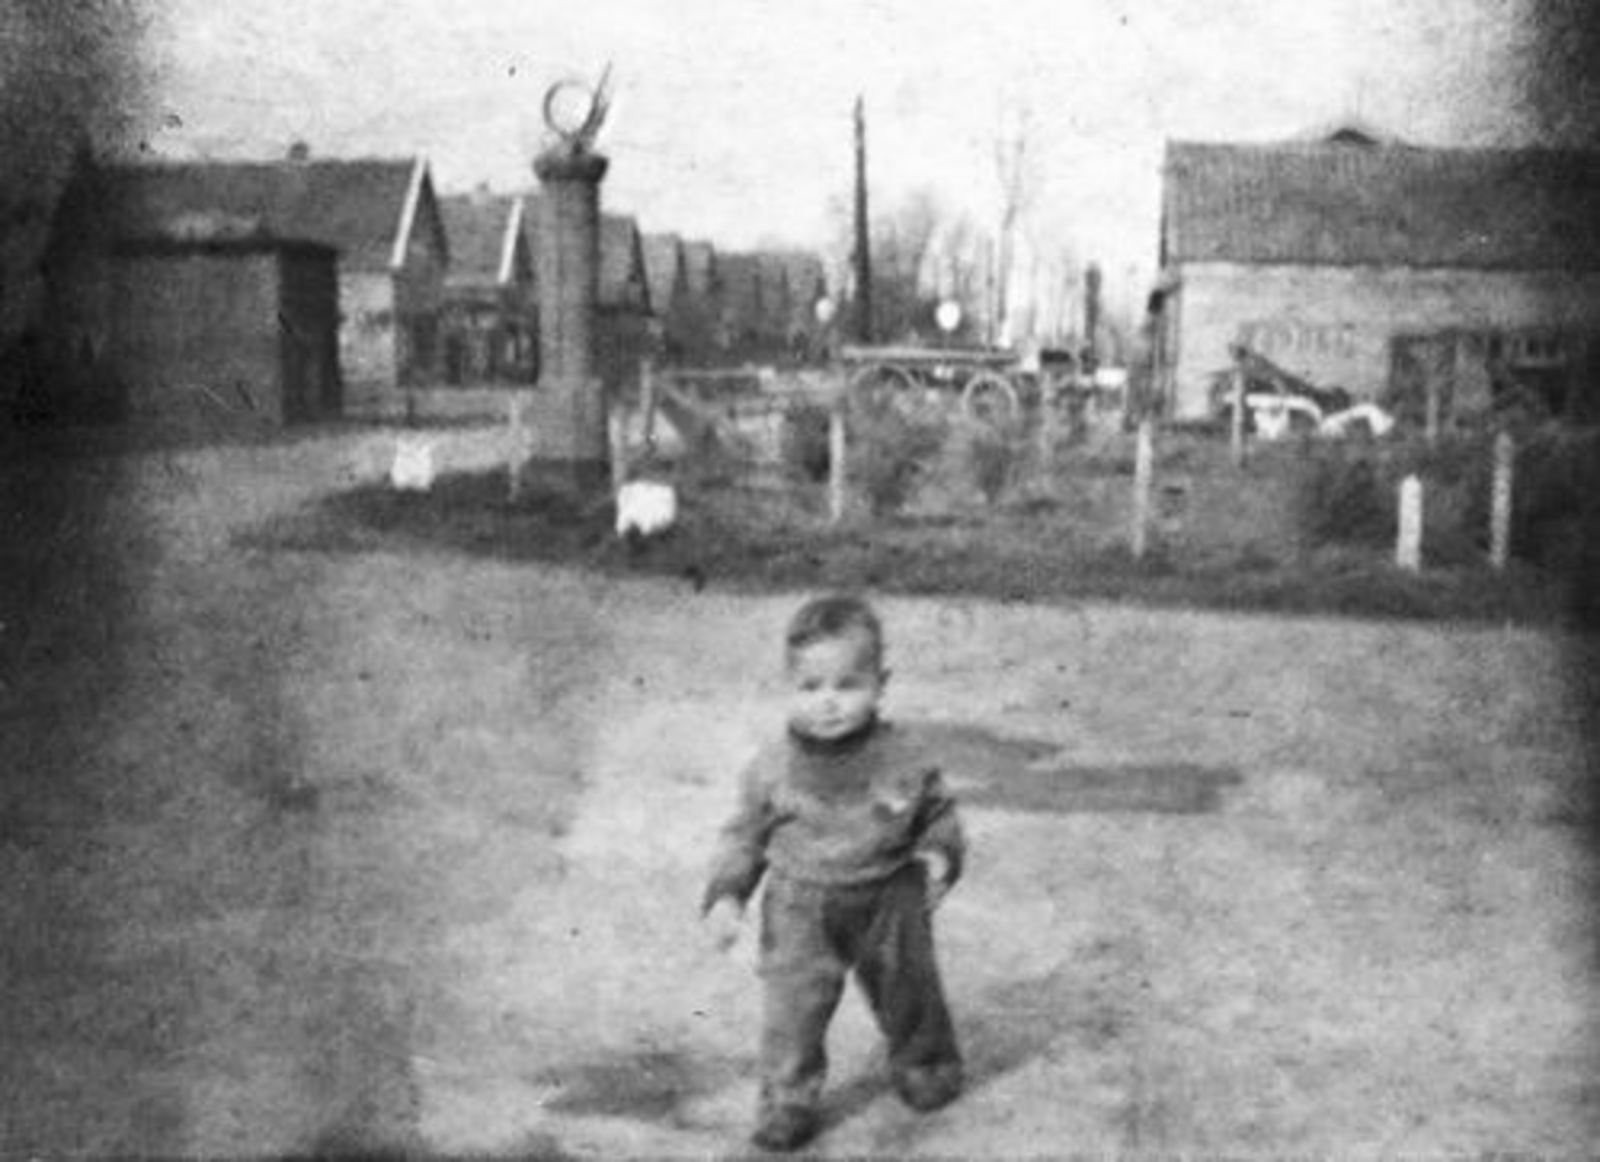 Kruisweg N 0300± 1942 kruising Aalsmeerderweg met Peuter Cees Stieva